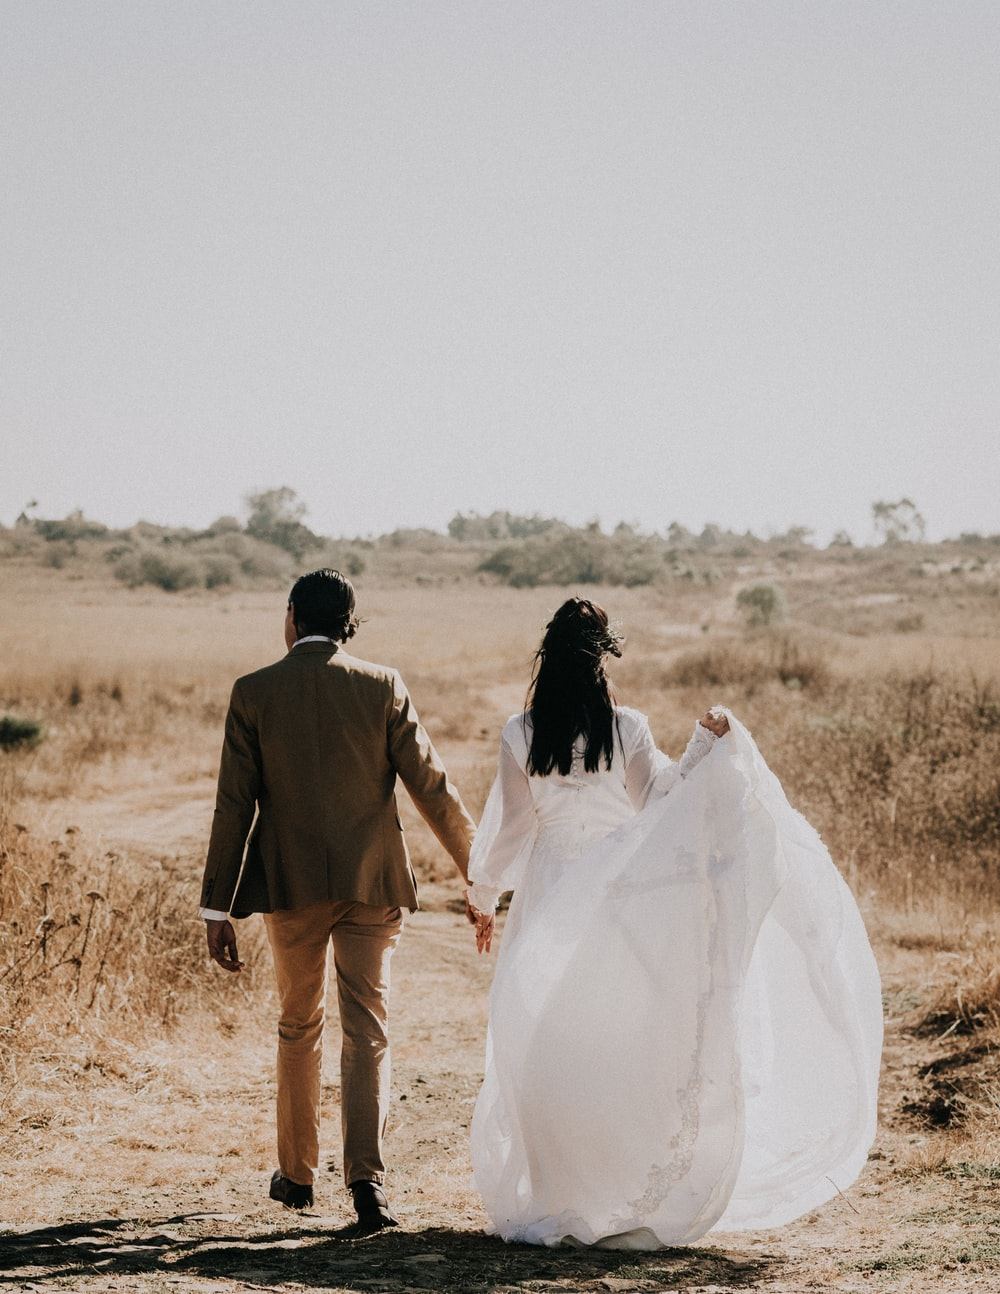 woman walking with man